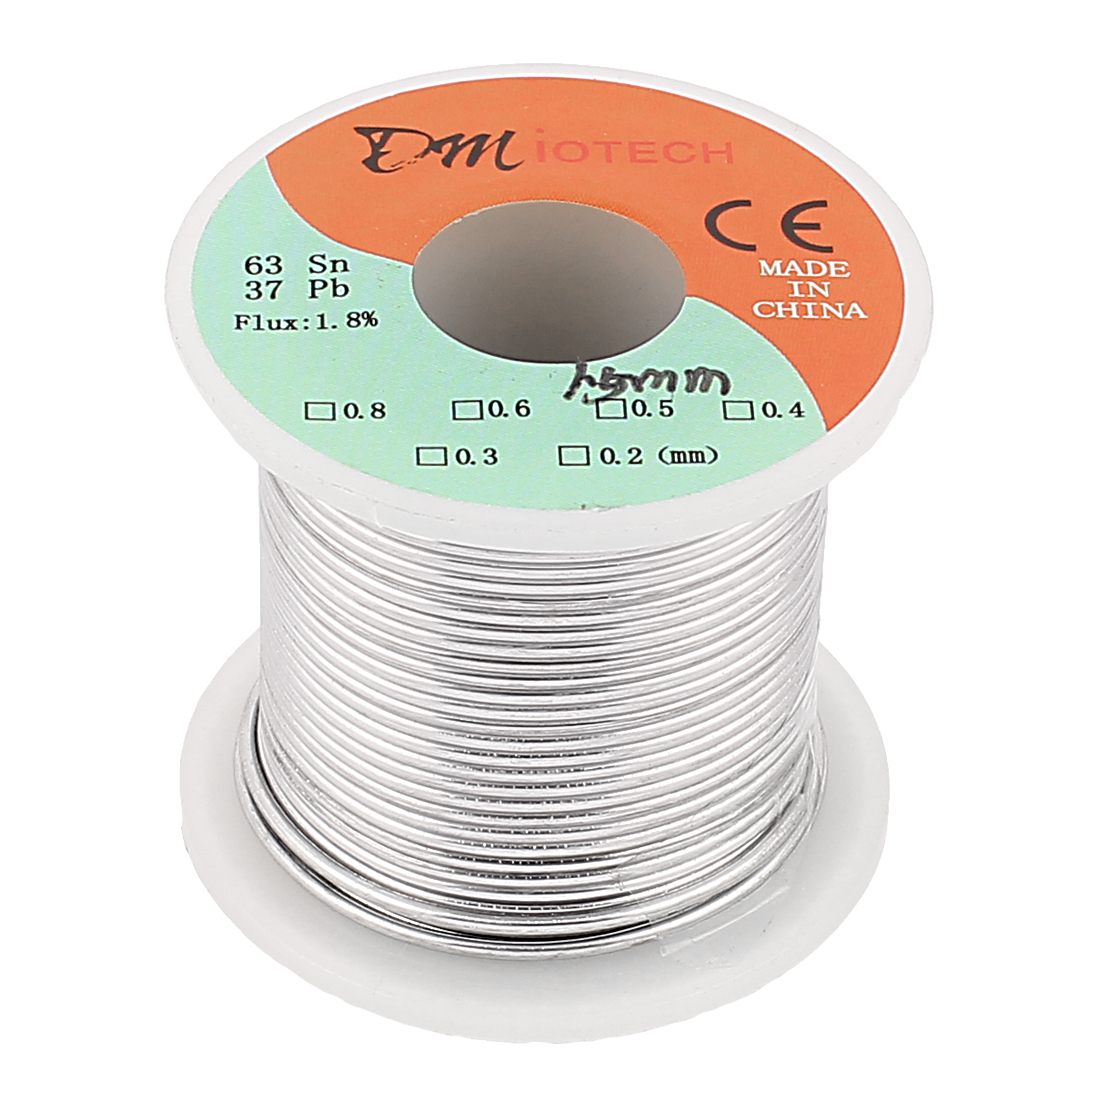 Unique Bargains 1.5mm 200G 63/37 Rosin Core Flux 1.8% Tin  Roll Solder Wire